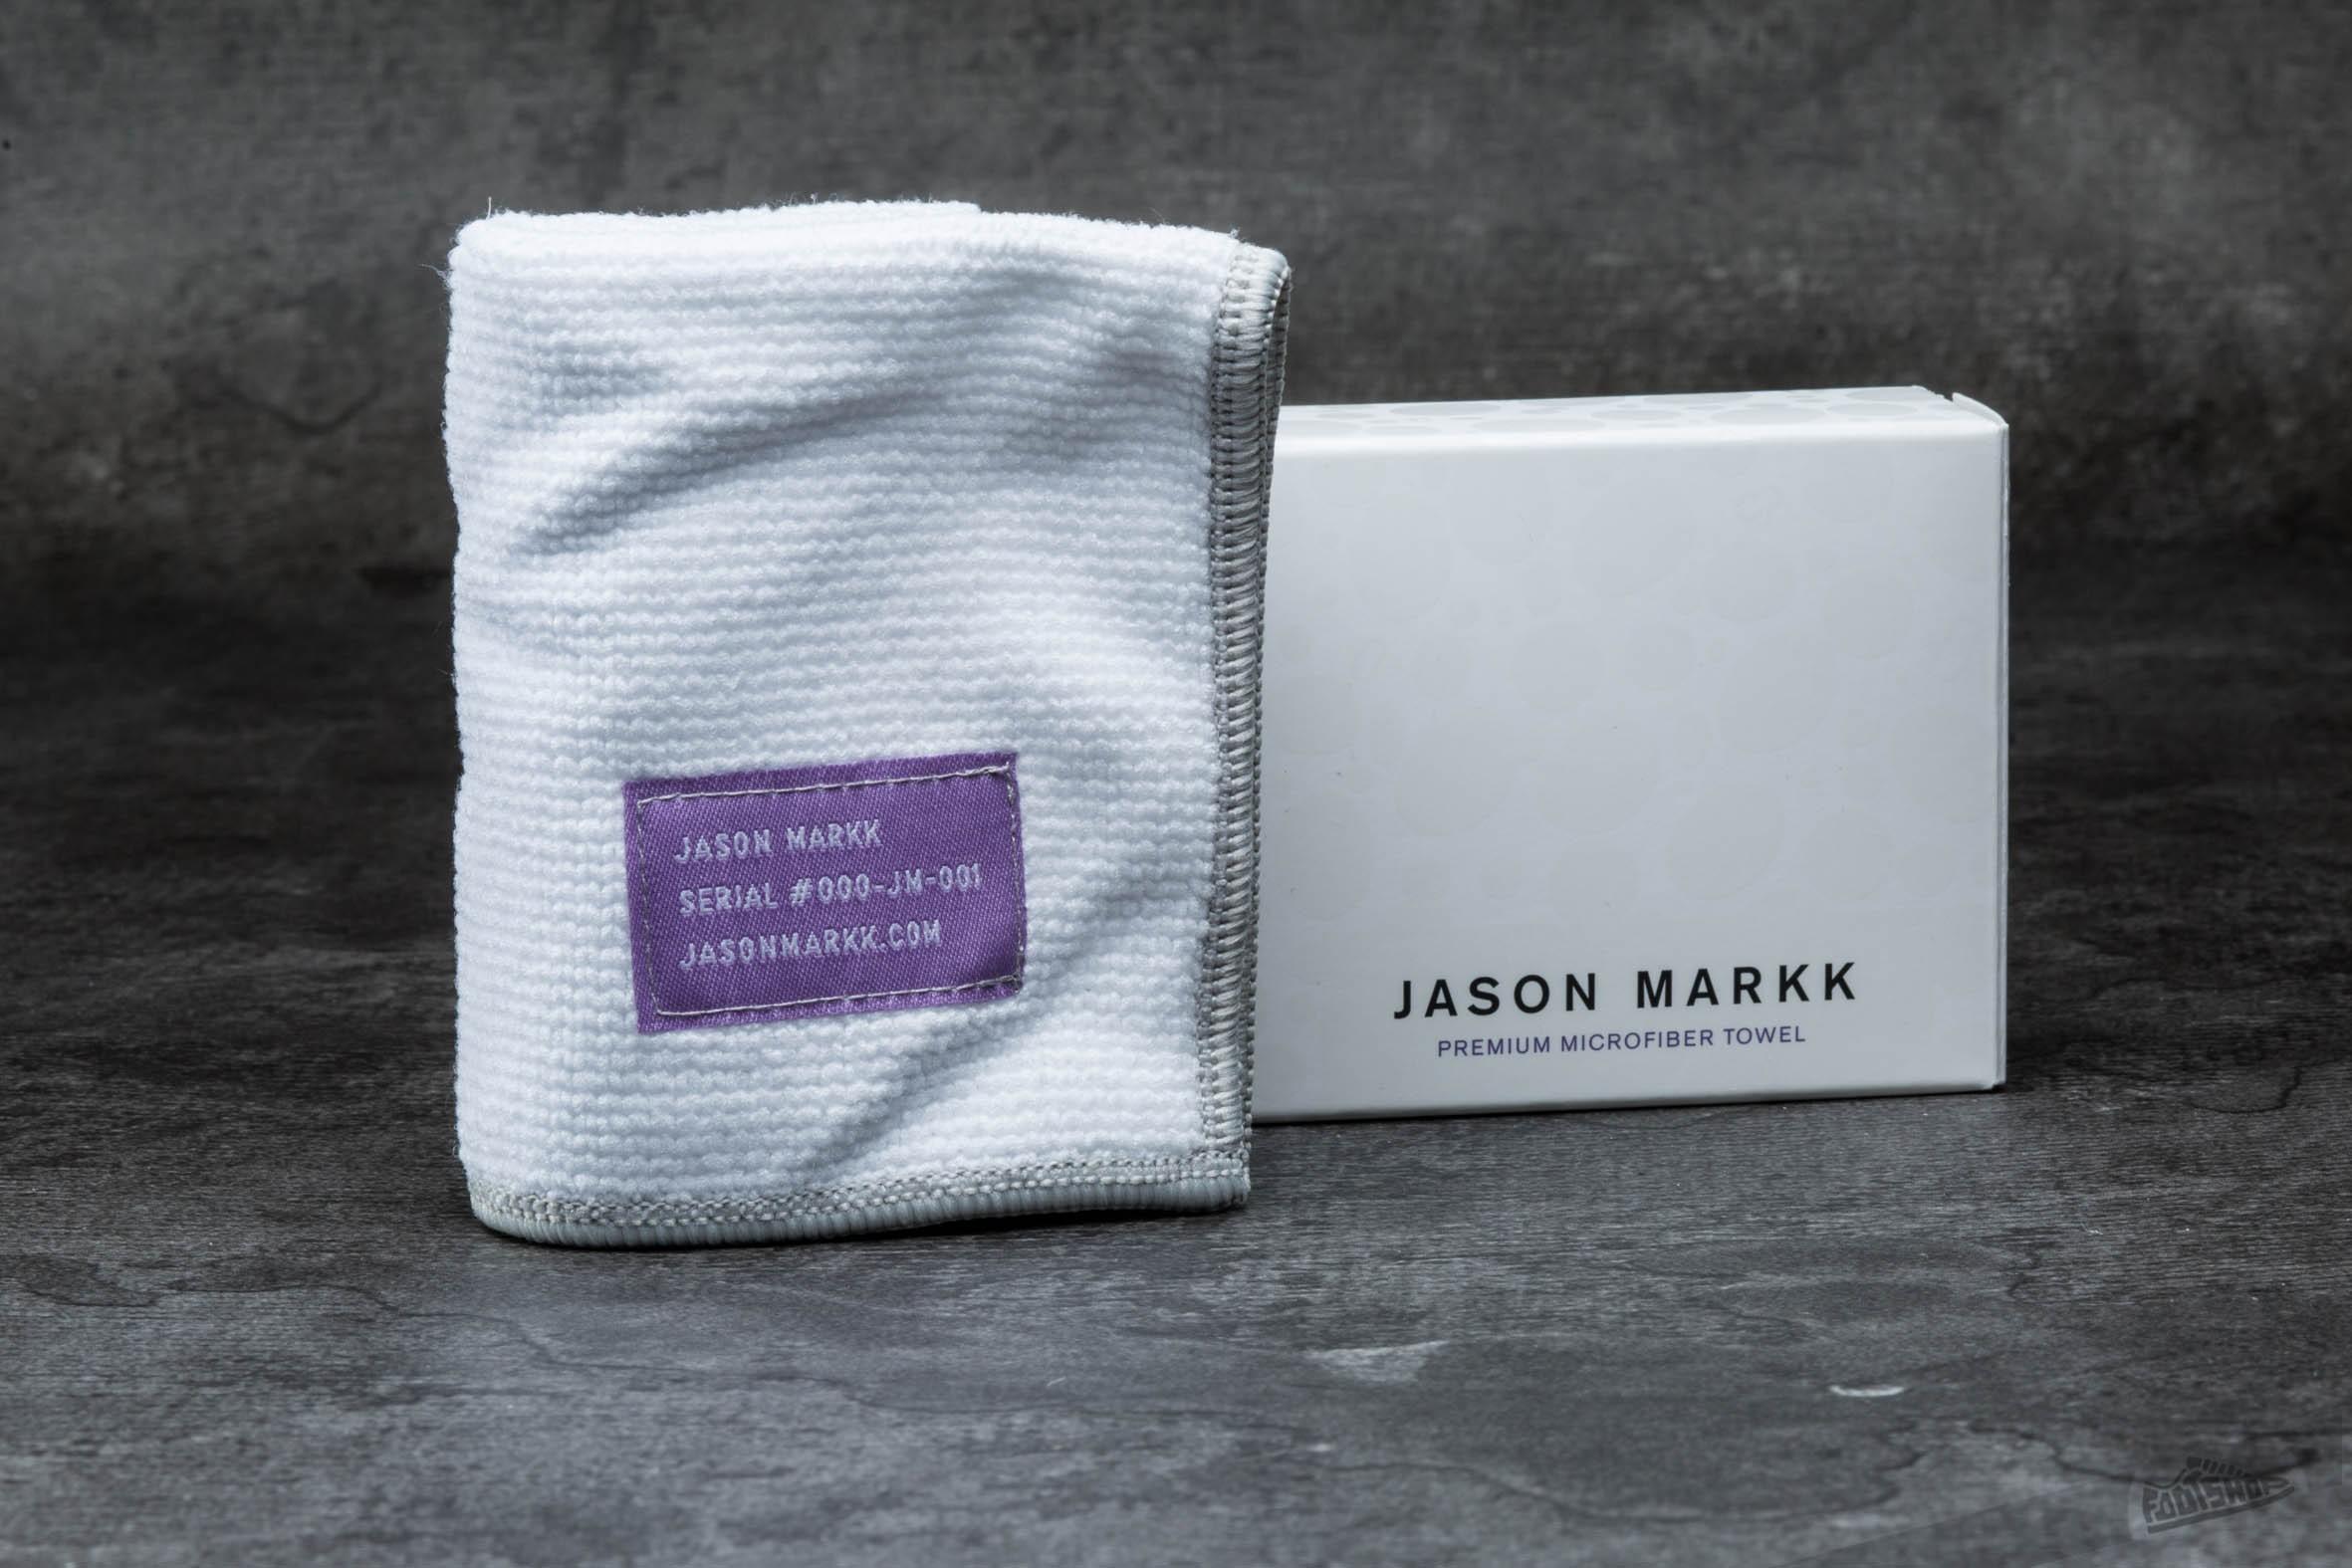 Jason Markk Premium Microfiber Towel Footshop – FR